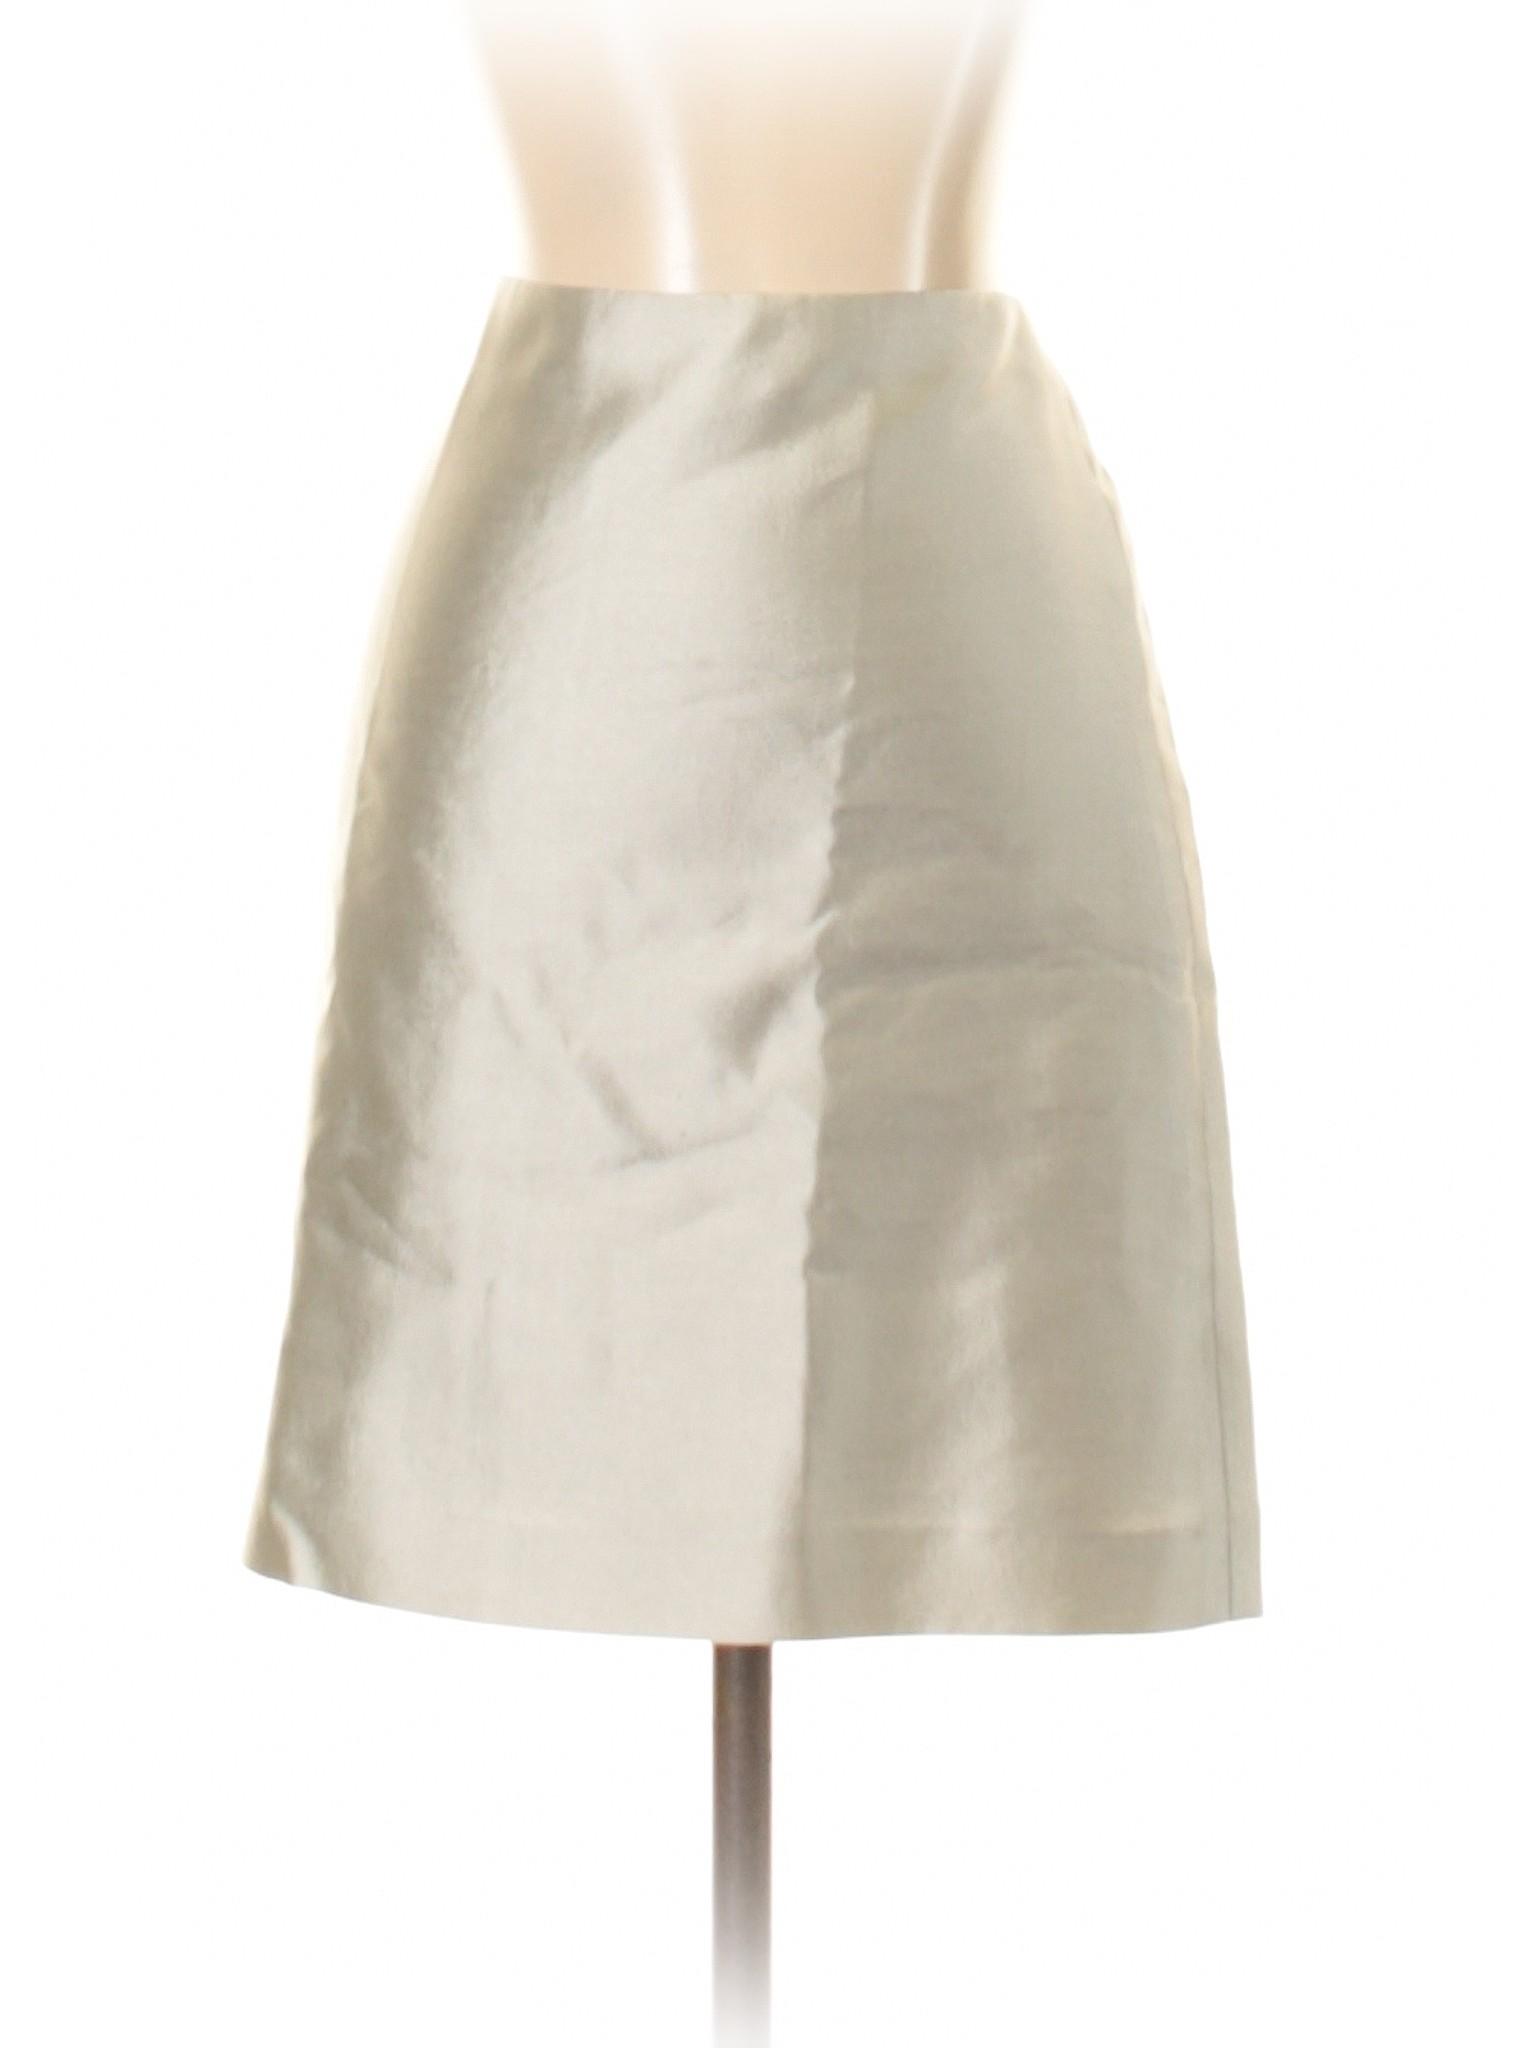 Skirt leisure Wool J Boutique Crew 61ROwpqw